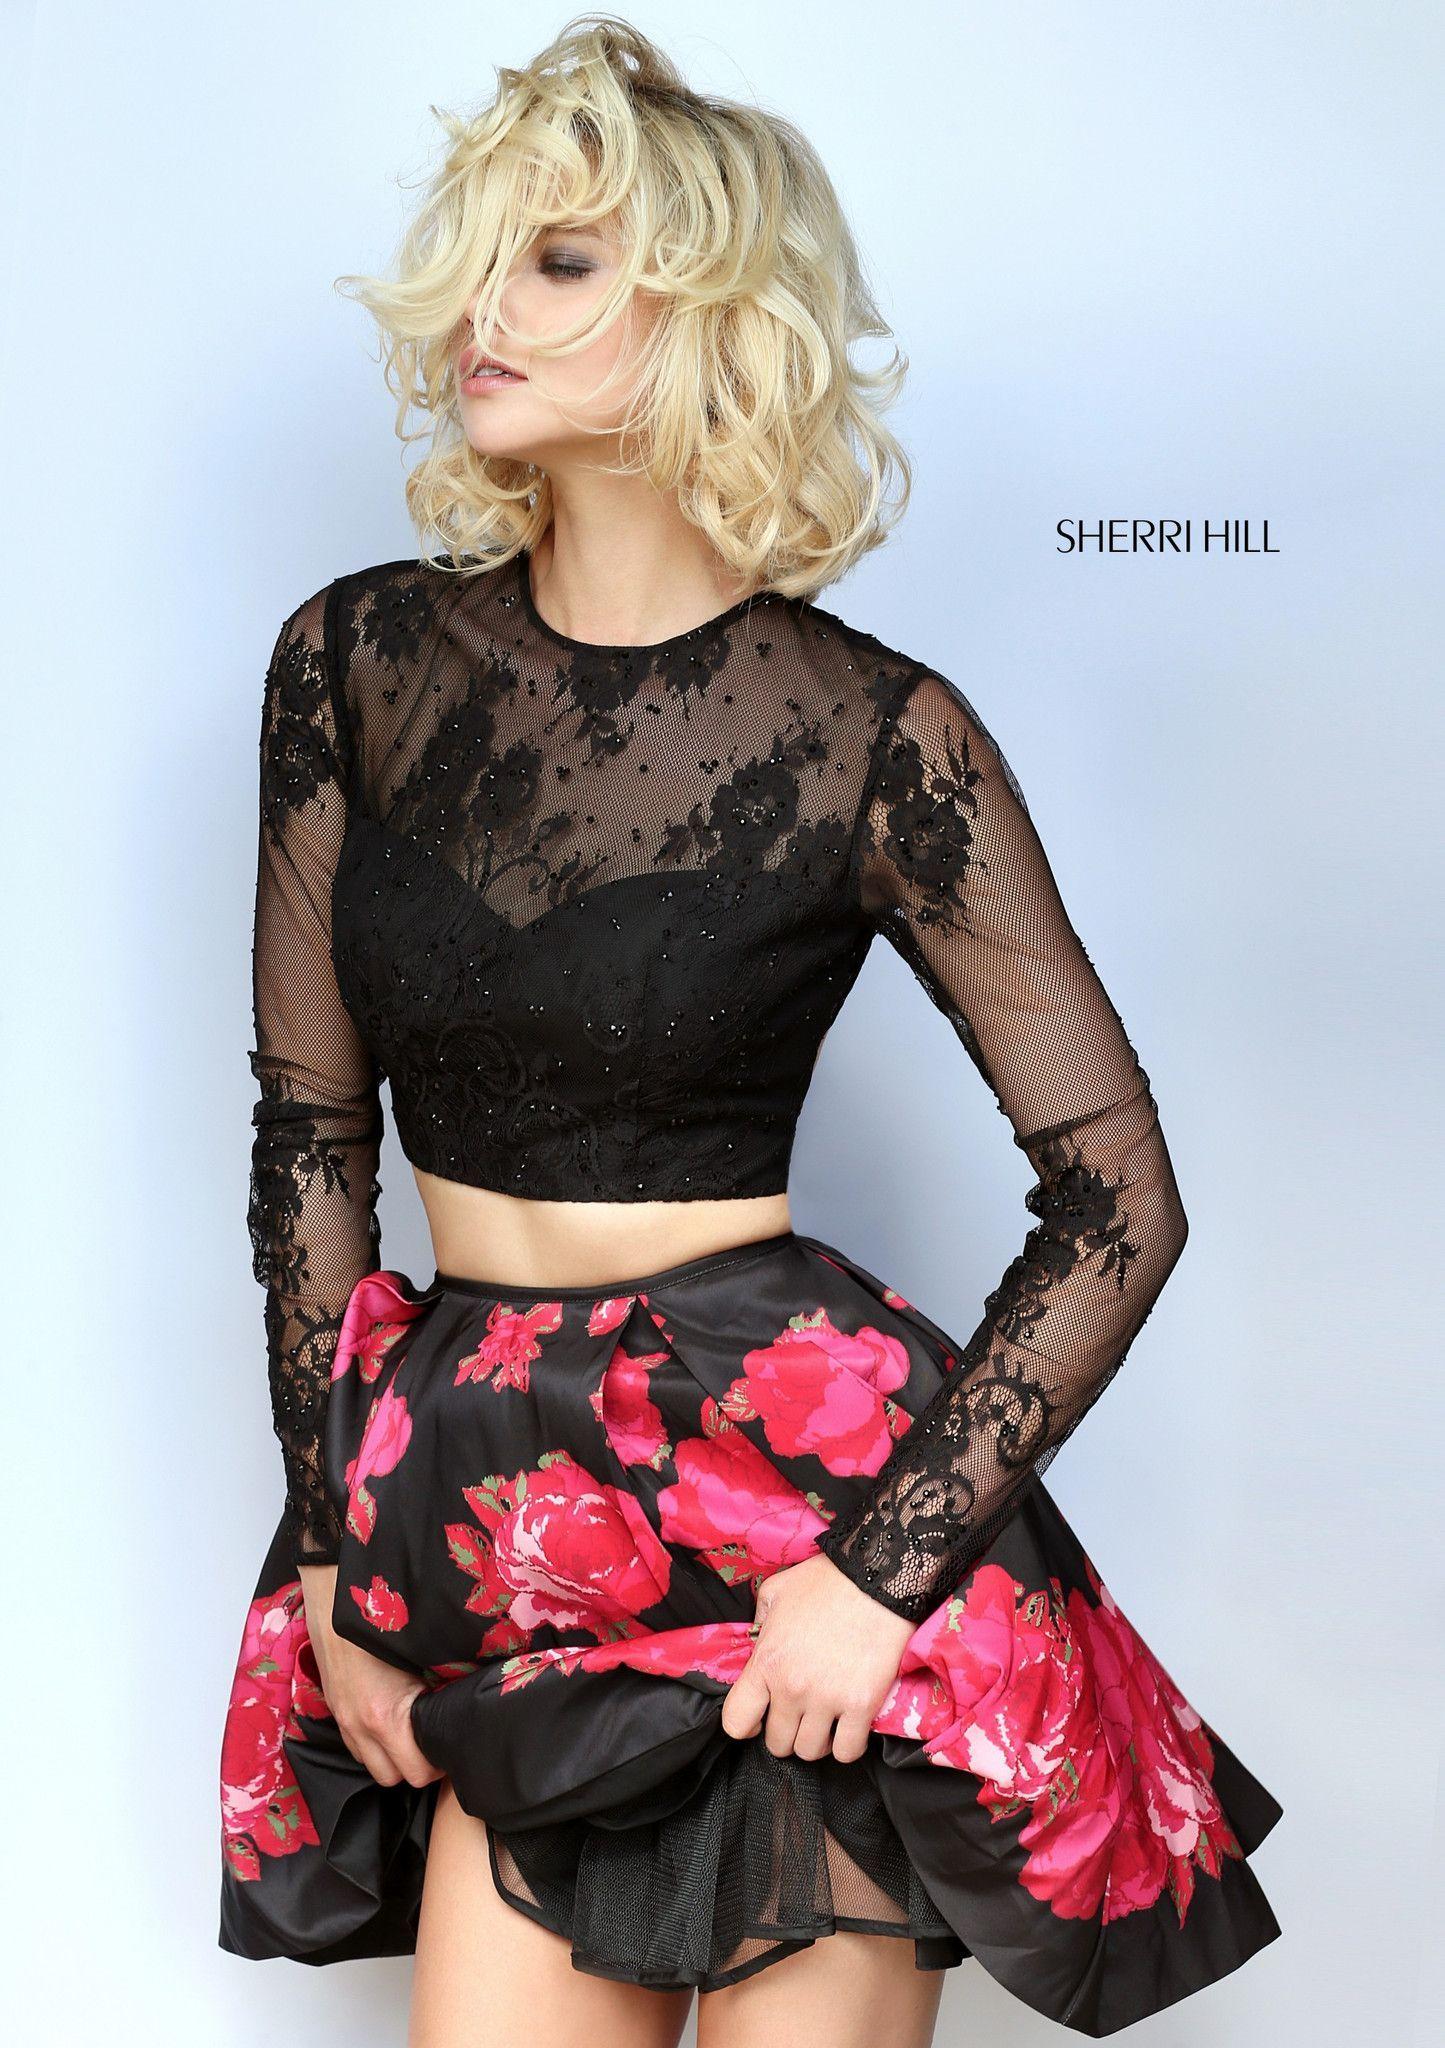 Sherri hill fashion pinterest homecoming prom and